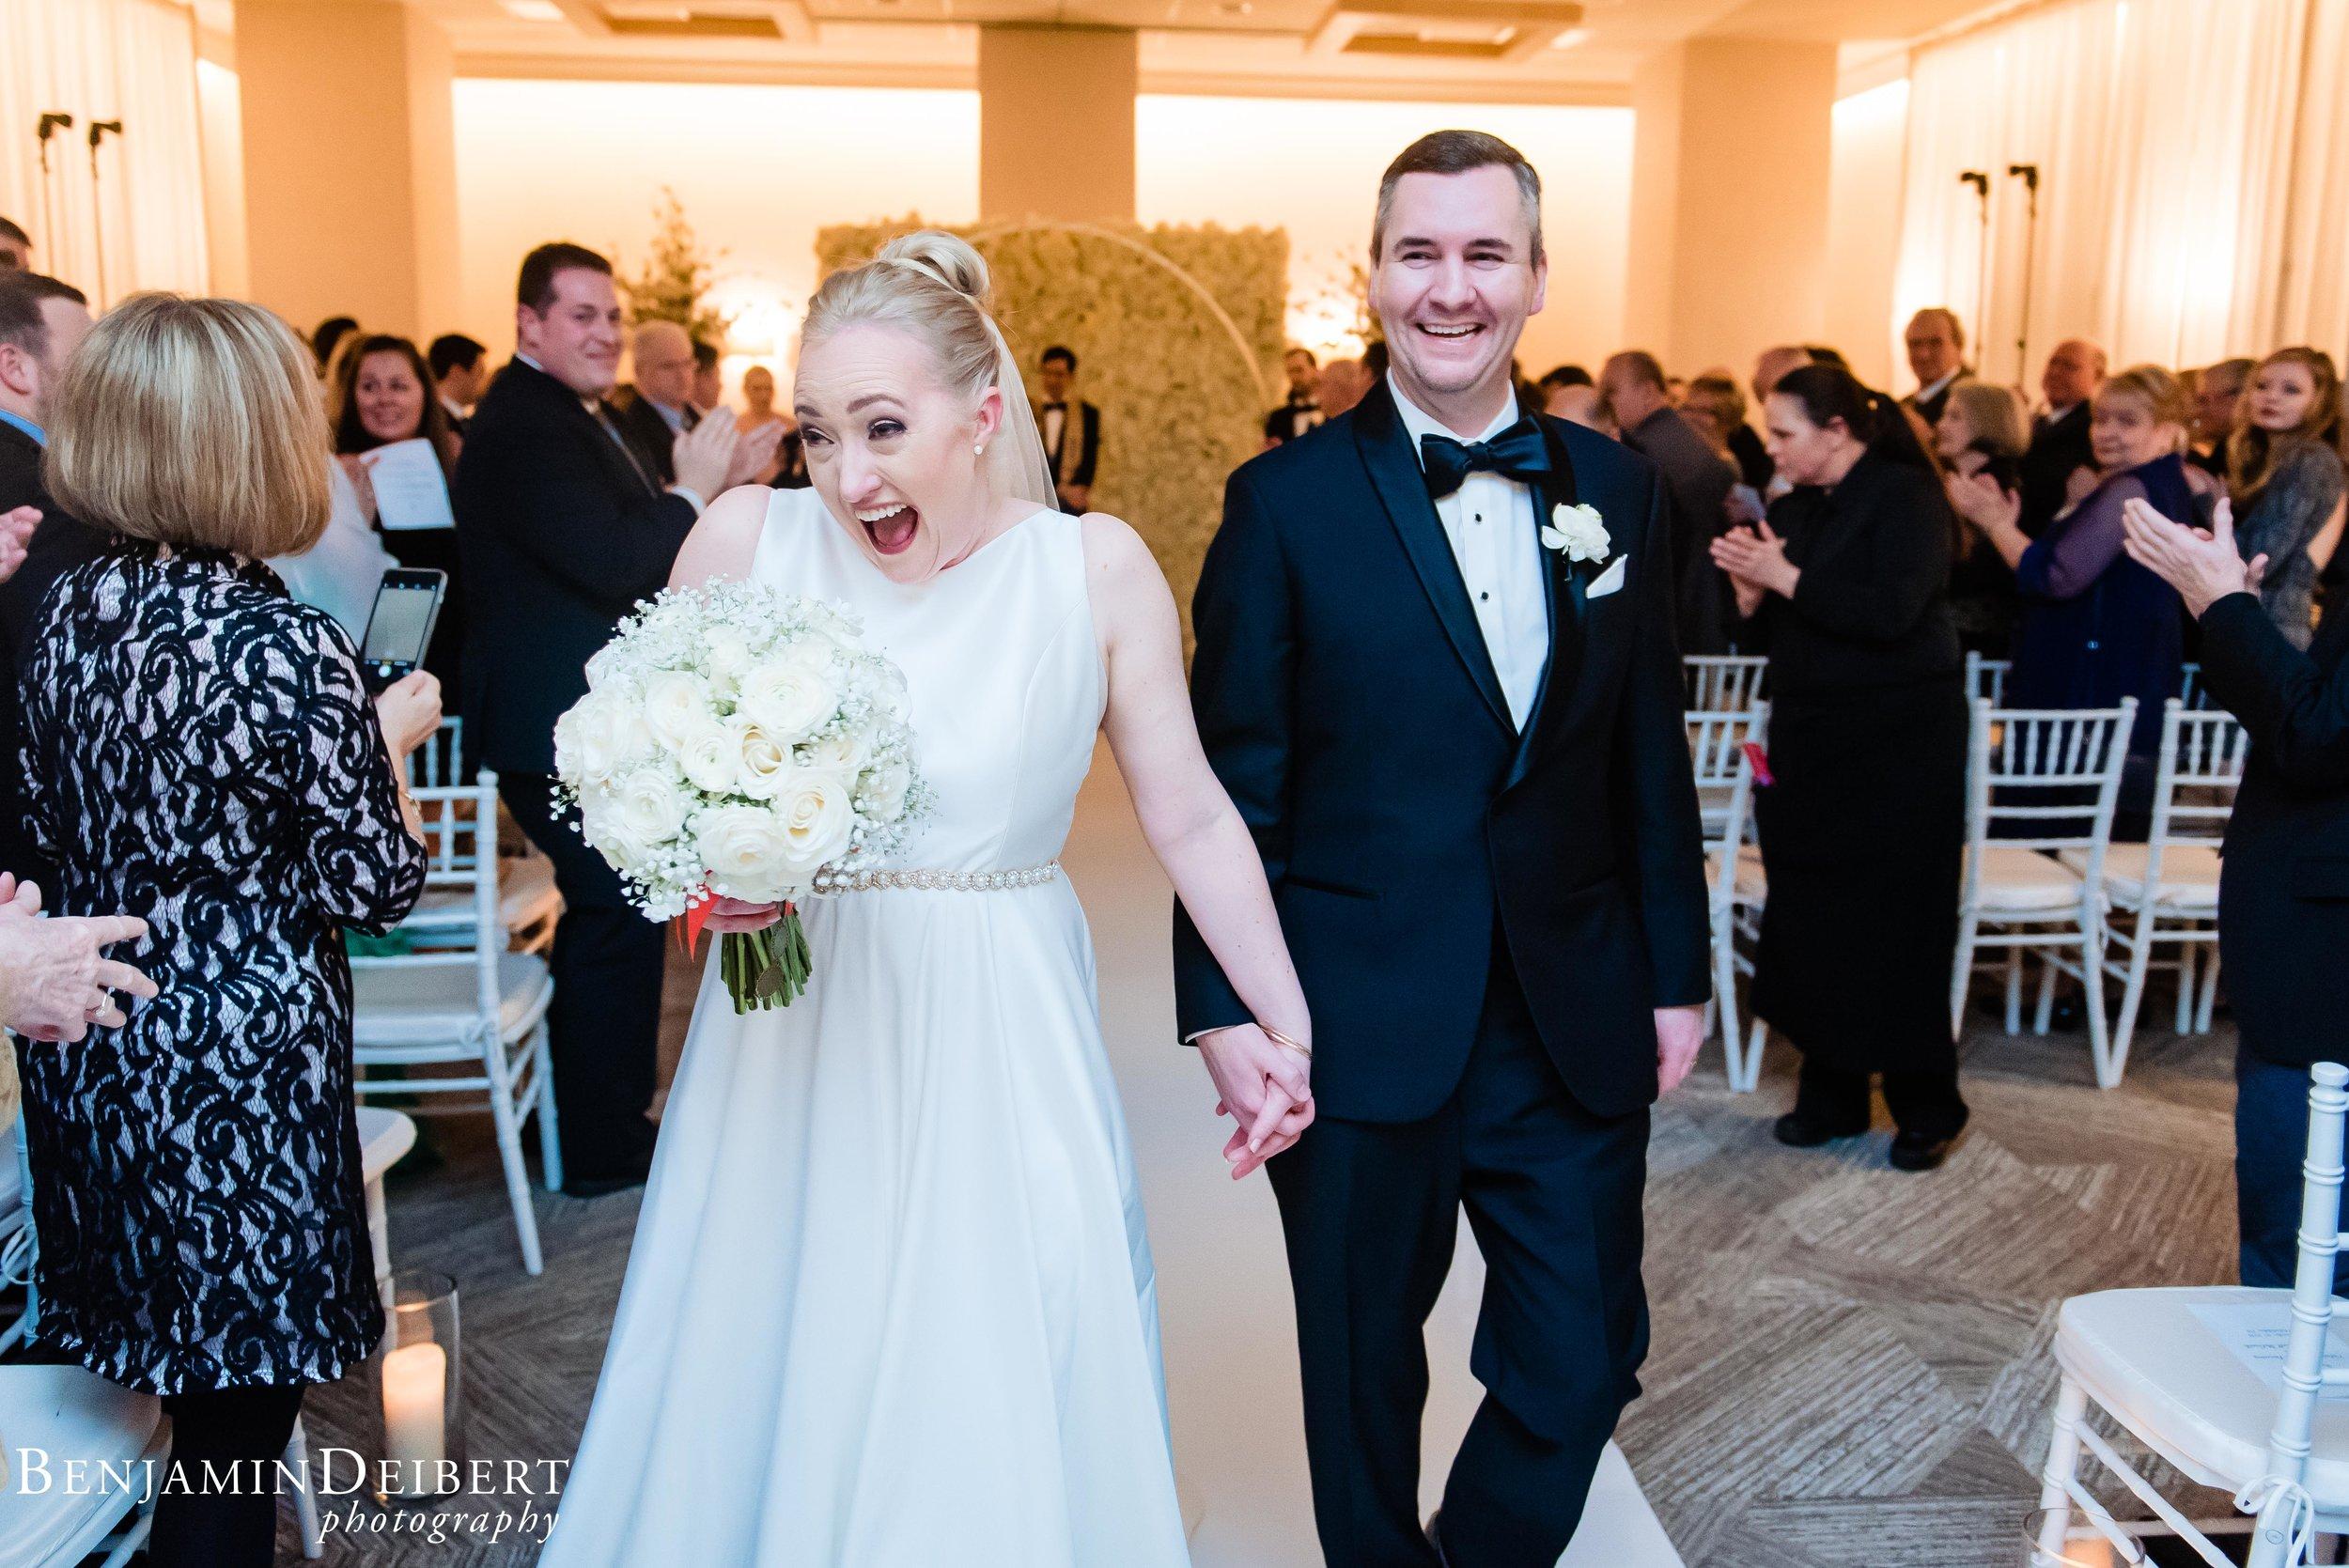 PatriceandAdam_TheLucy__Cescaphe_Wedding-45.jpg